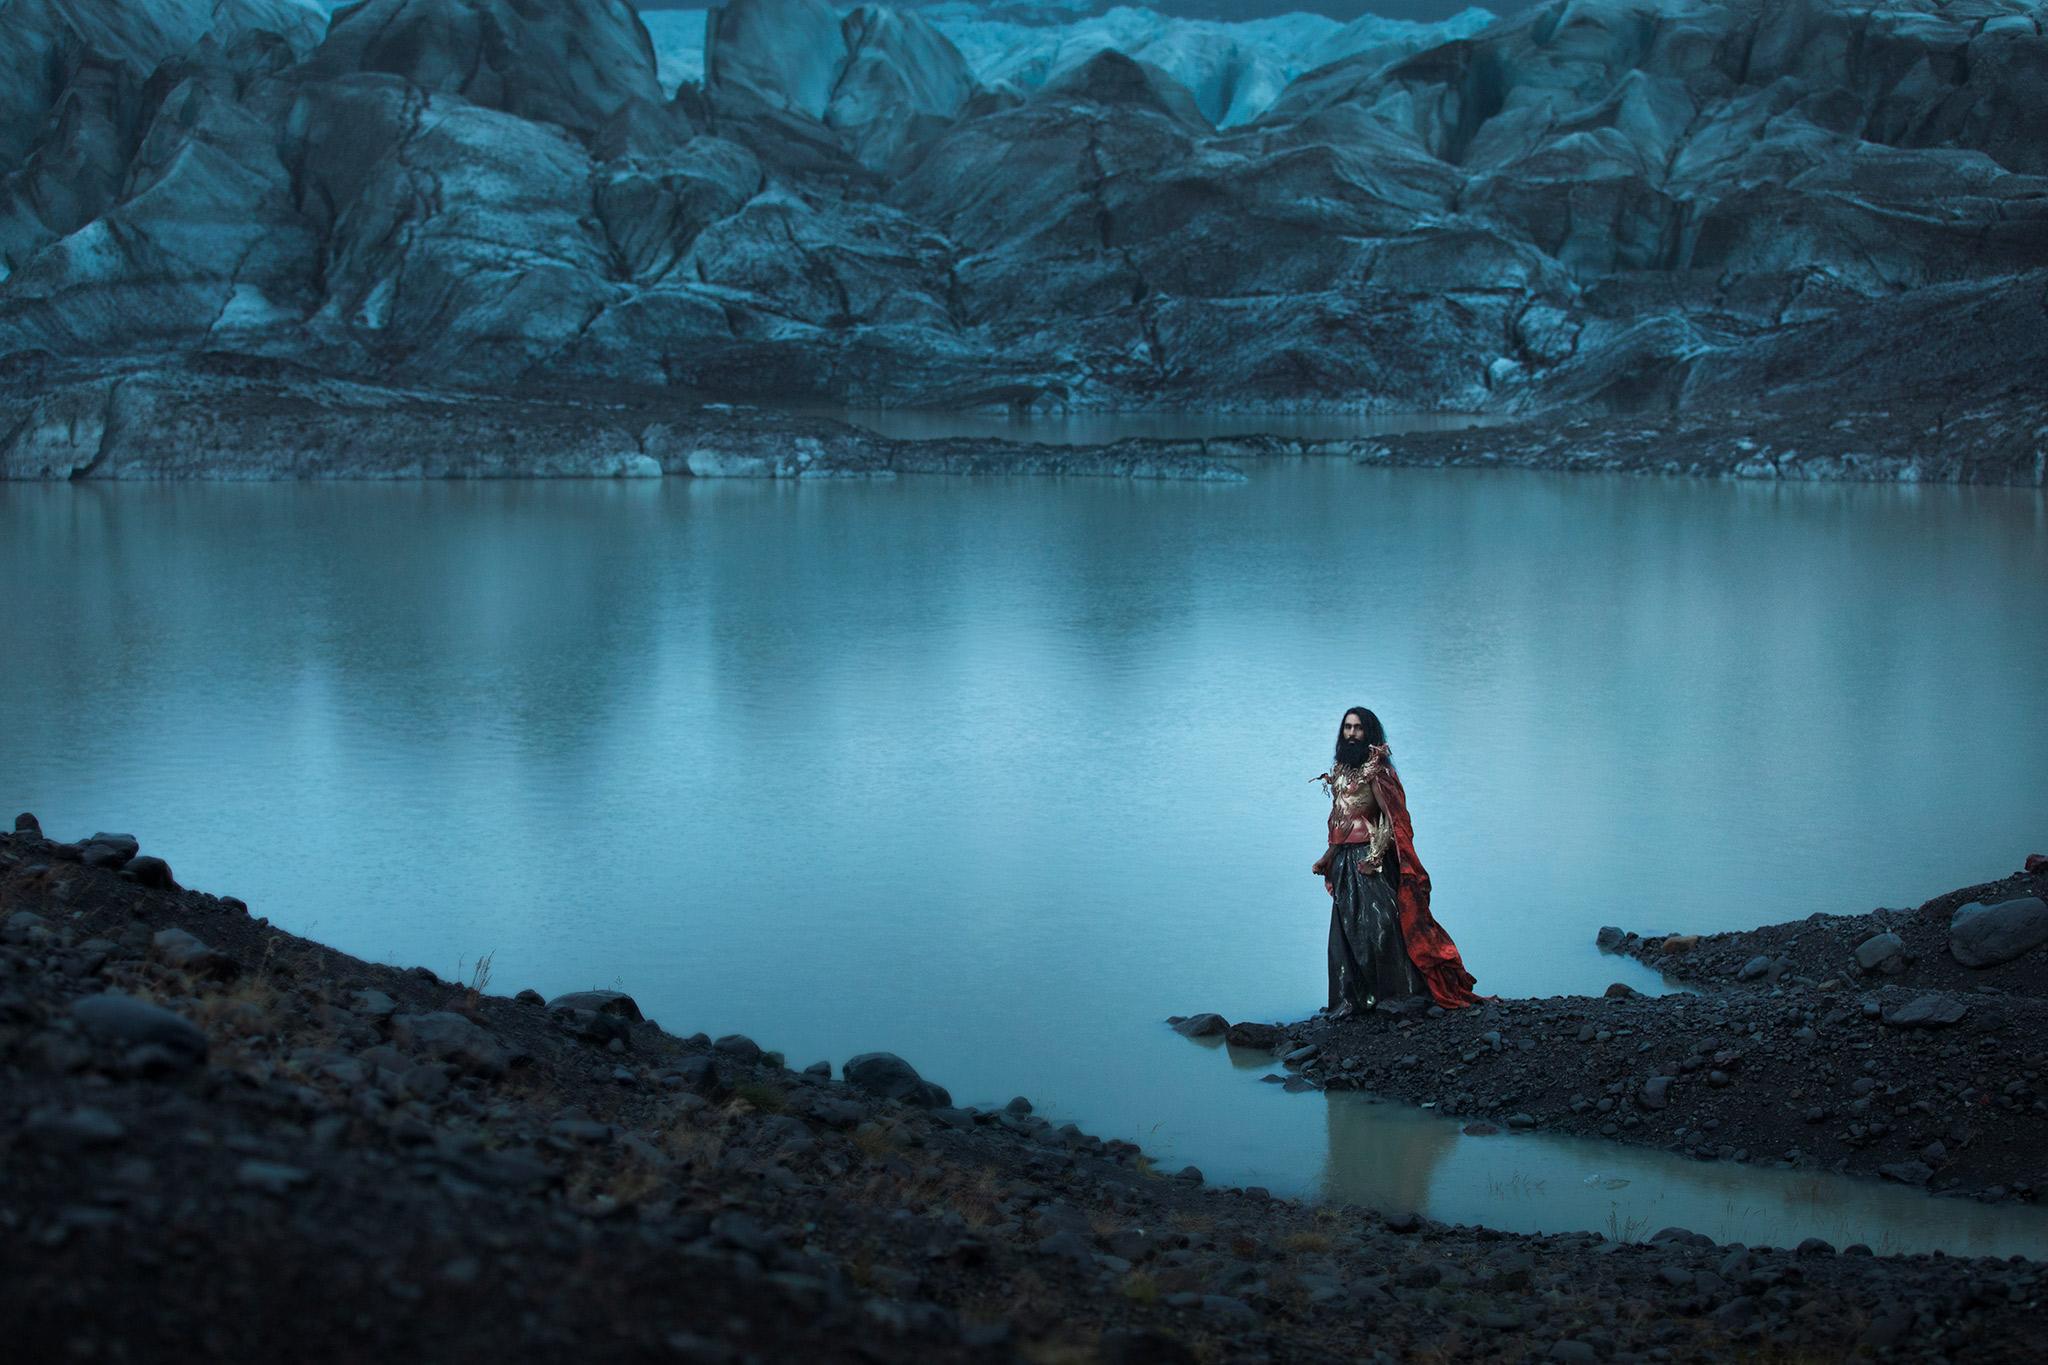 Grace-Almera-Iceland-Nouman-Malik-Free-Spirit-Team-melting-glaciers.jpg